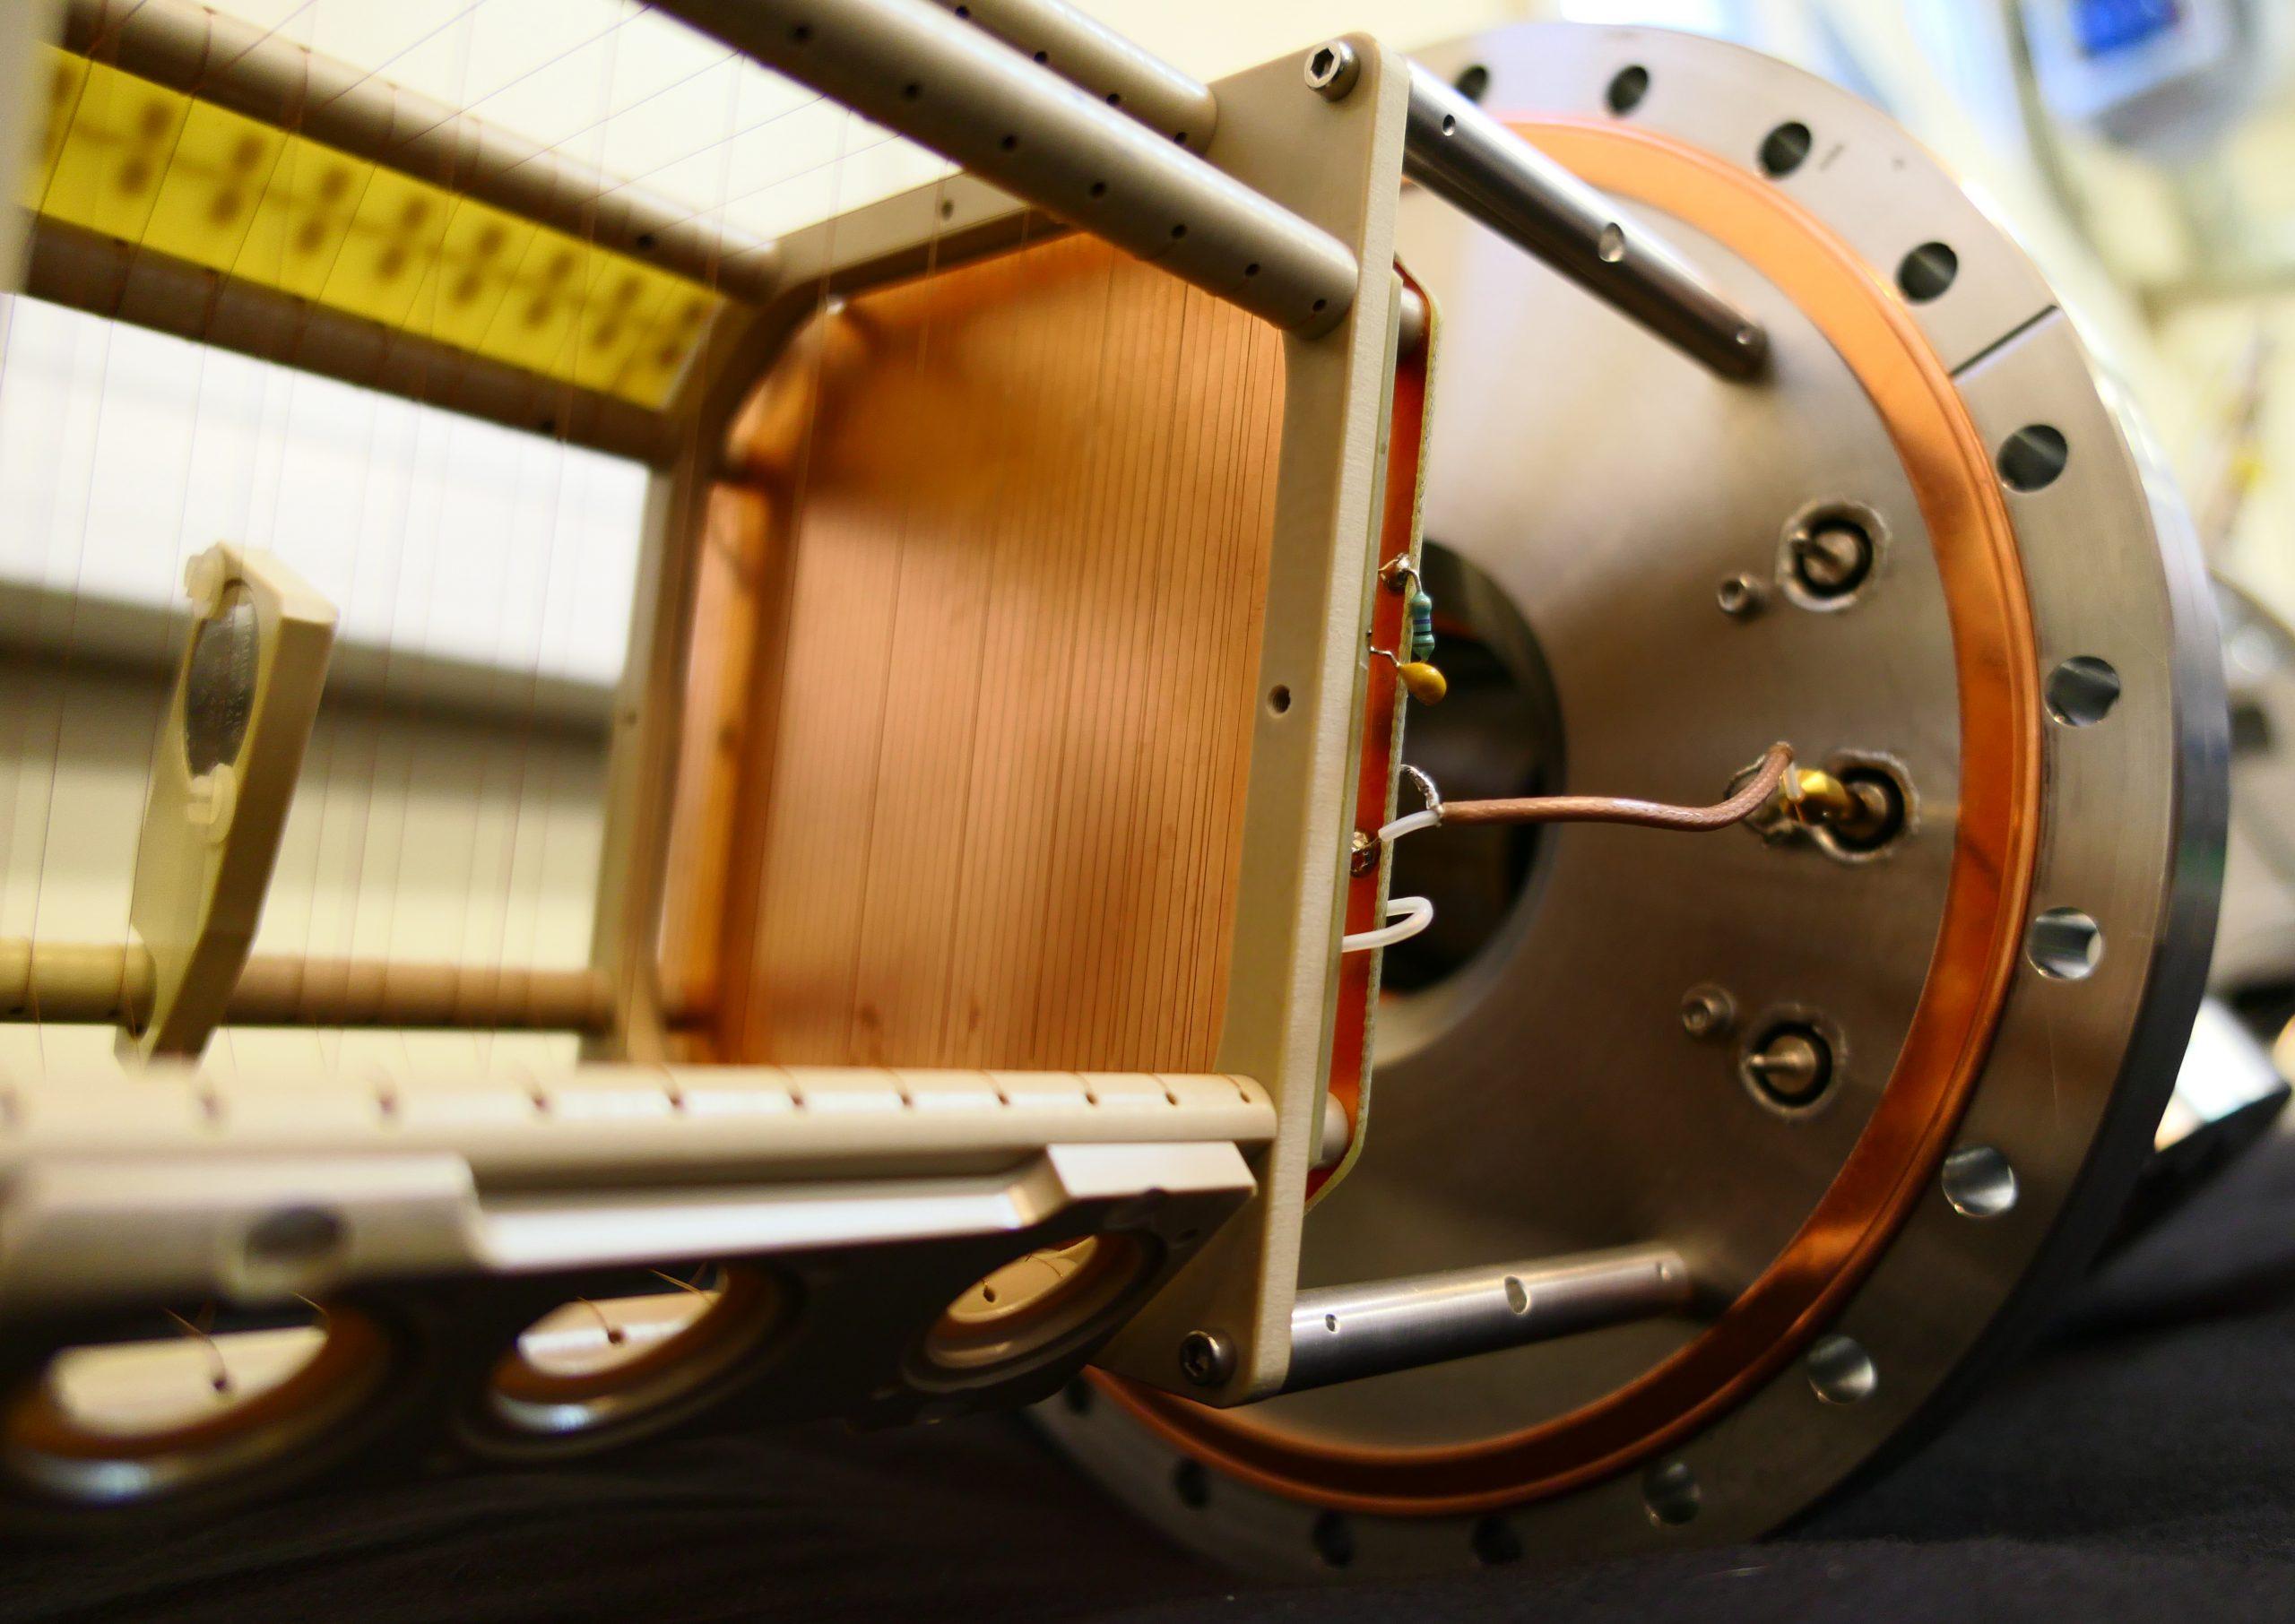 Physique des réacteurs. Expérience SCALP. Scintillating ionization Chamber for ALPha particle detection in neutron induced reactions.